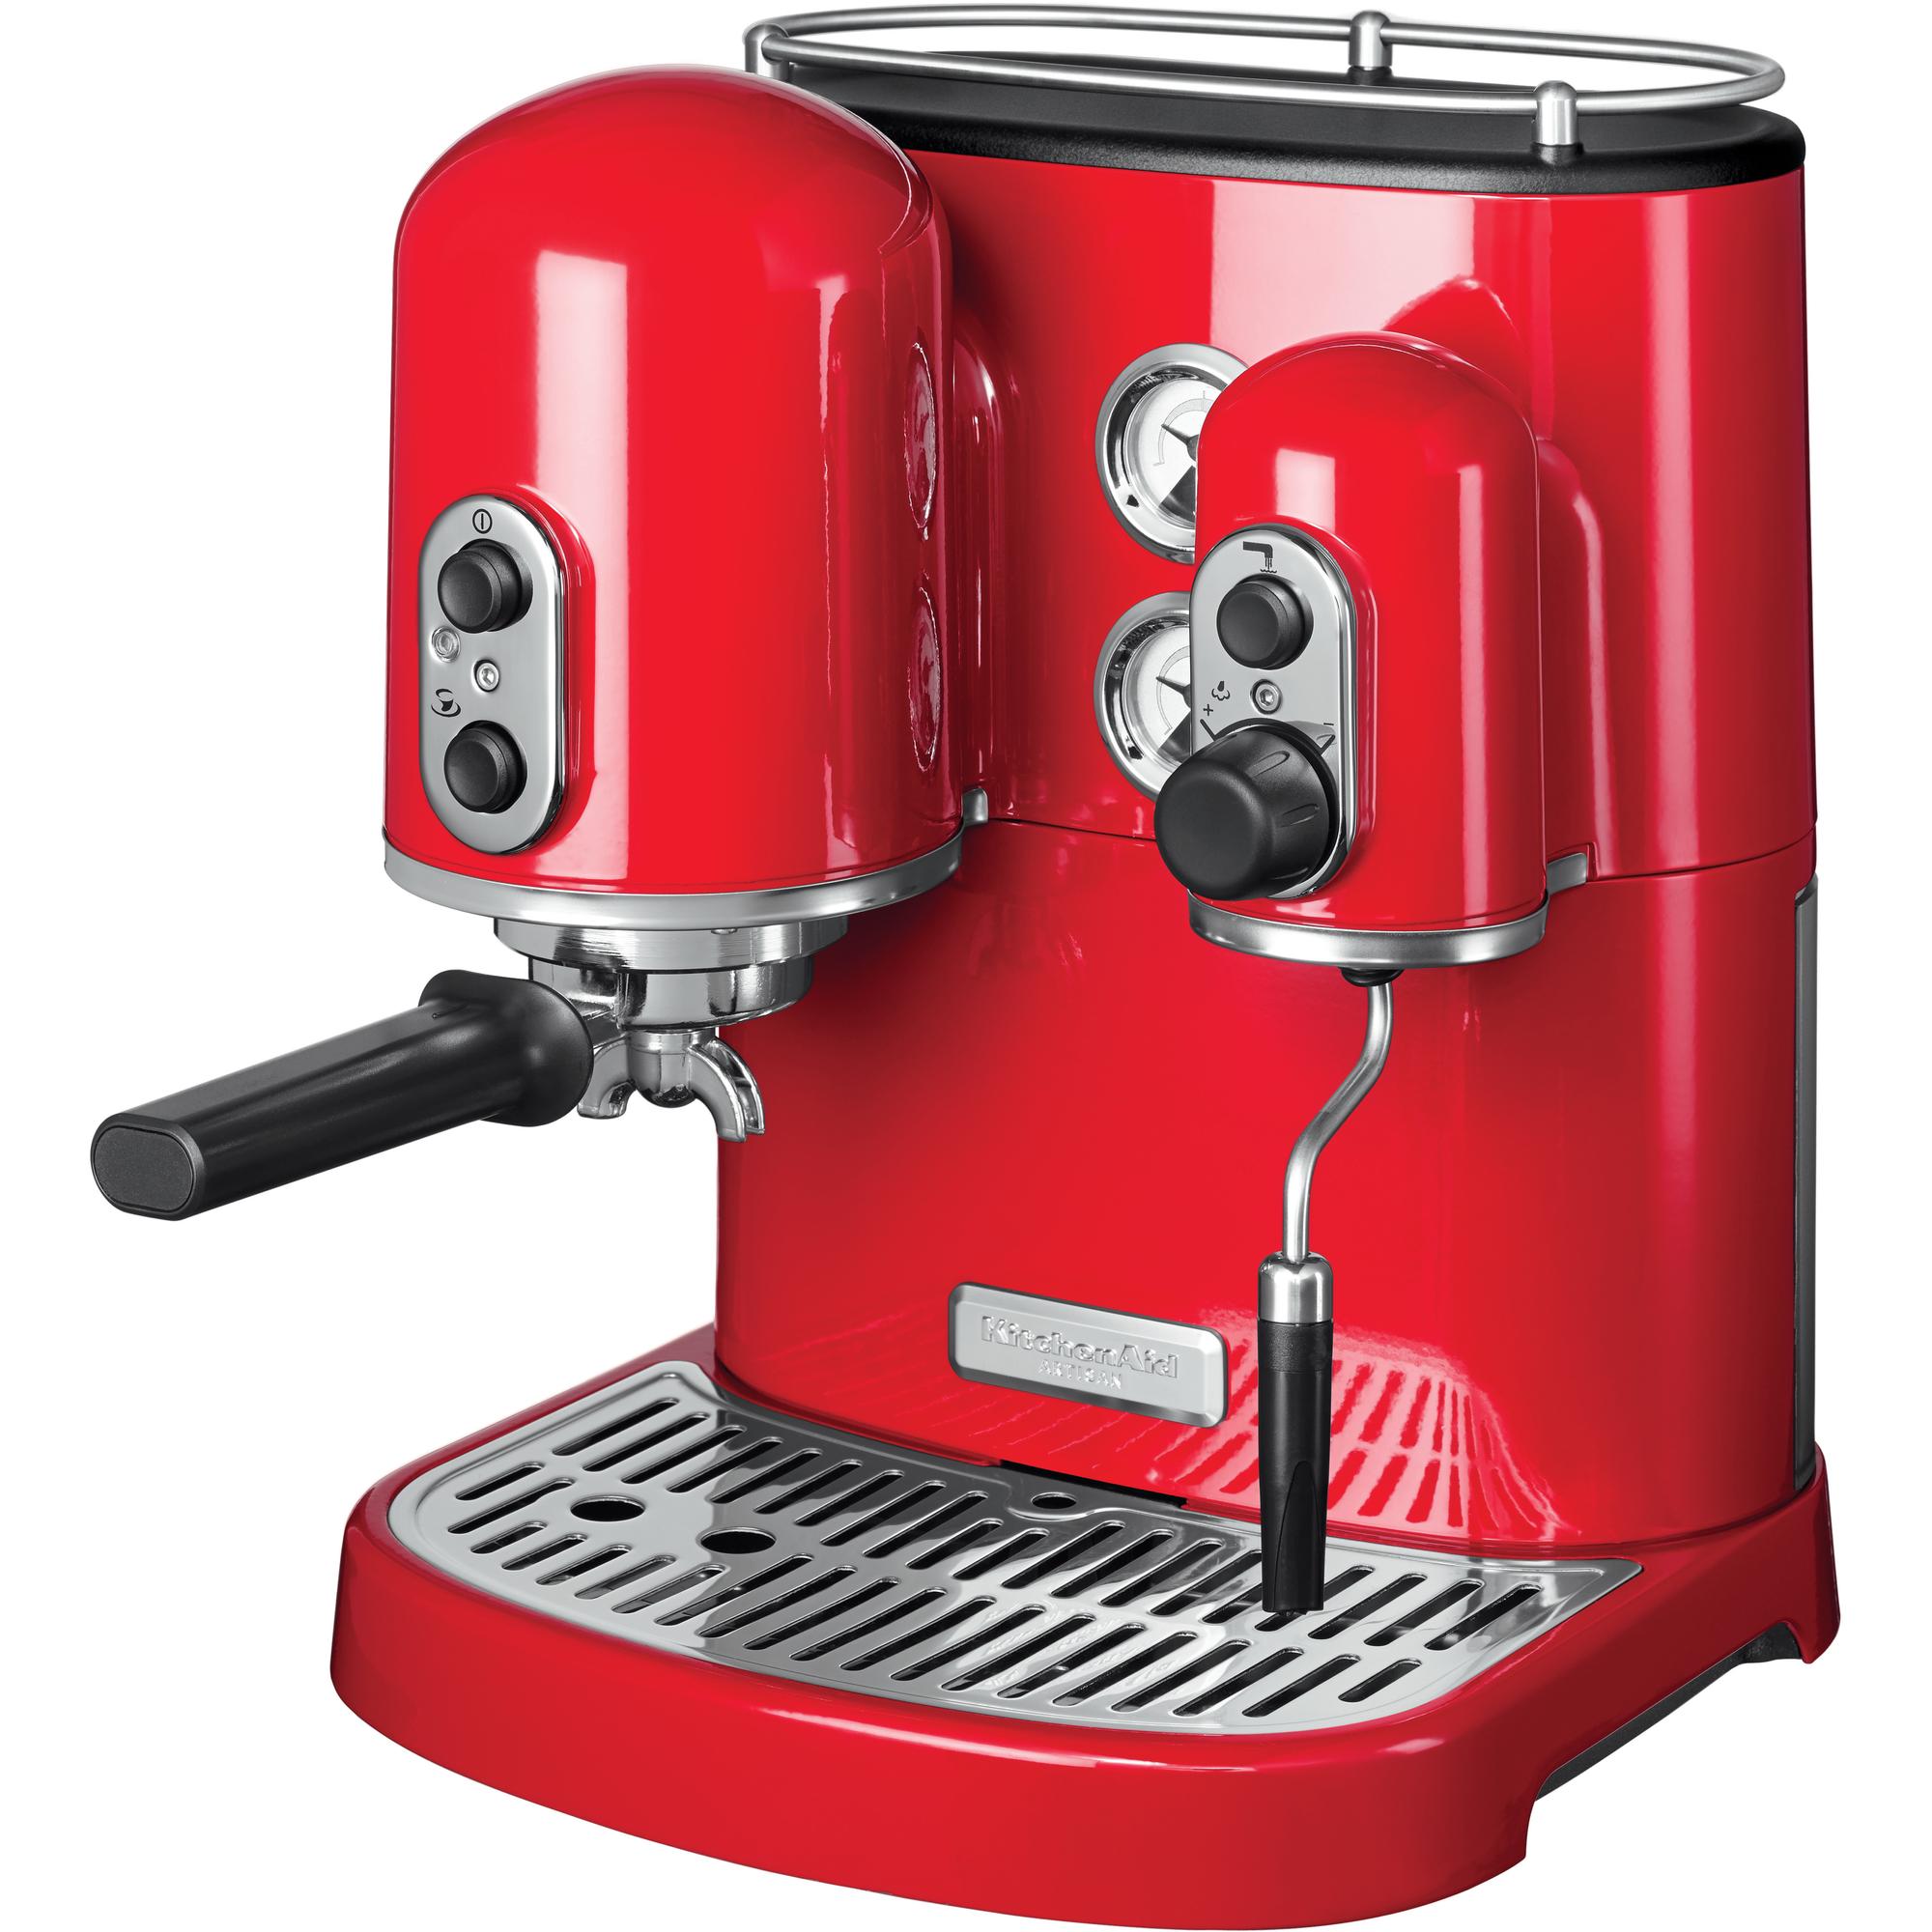 kitchenaid artisan espressomaschine 5kes2102 5kes2102 wer haushaltskleinger te. Black Bedroom Furniture Sets. Home Design Ideas